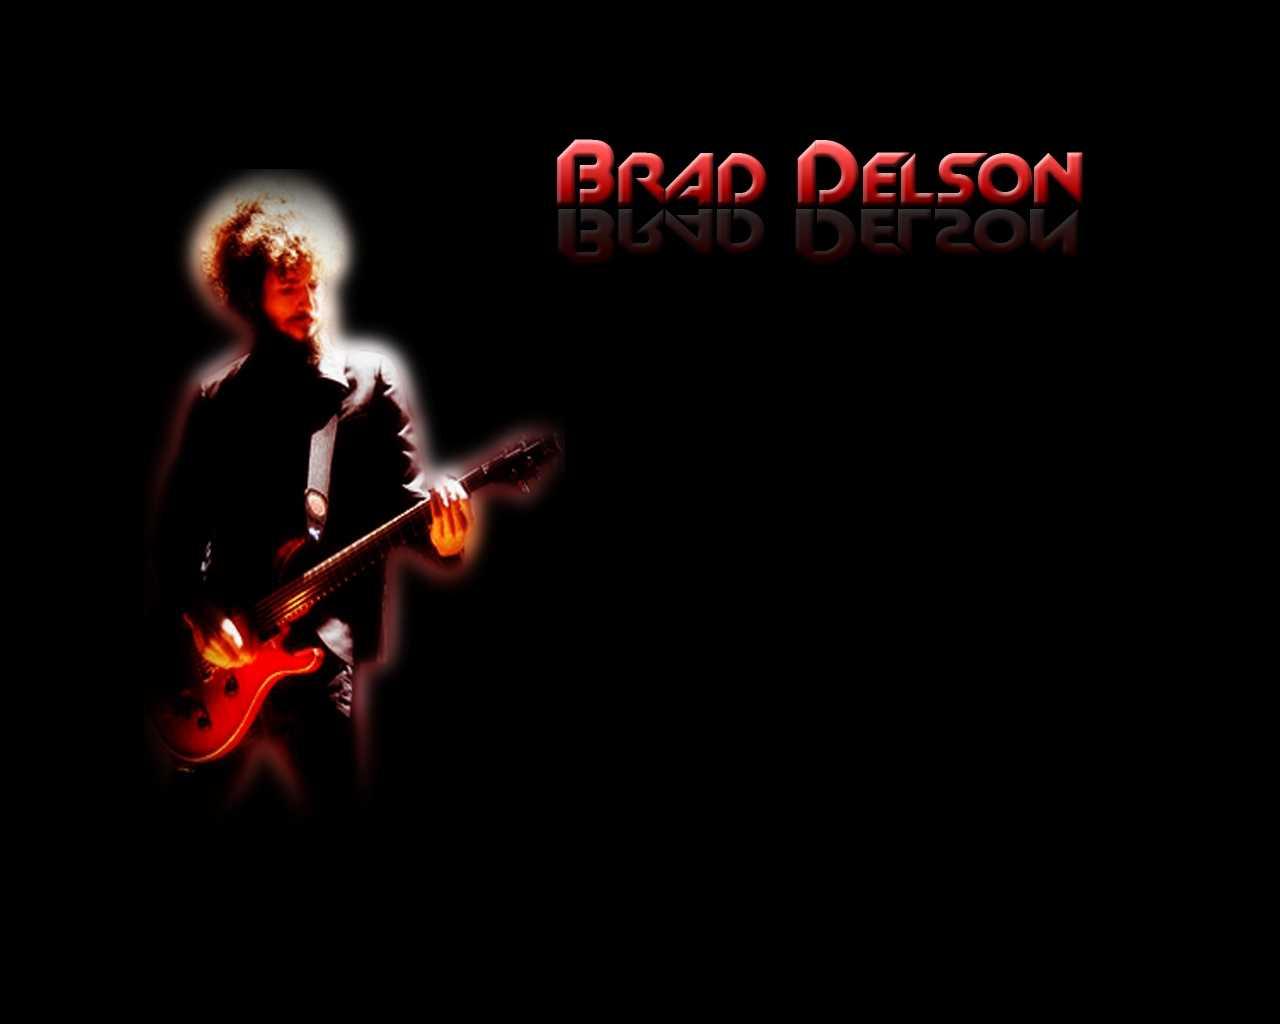 Brad Delson